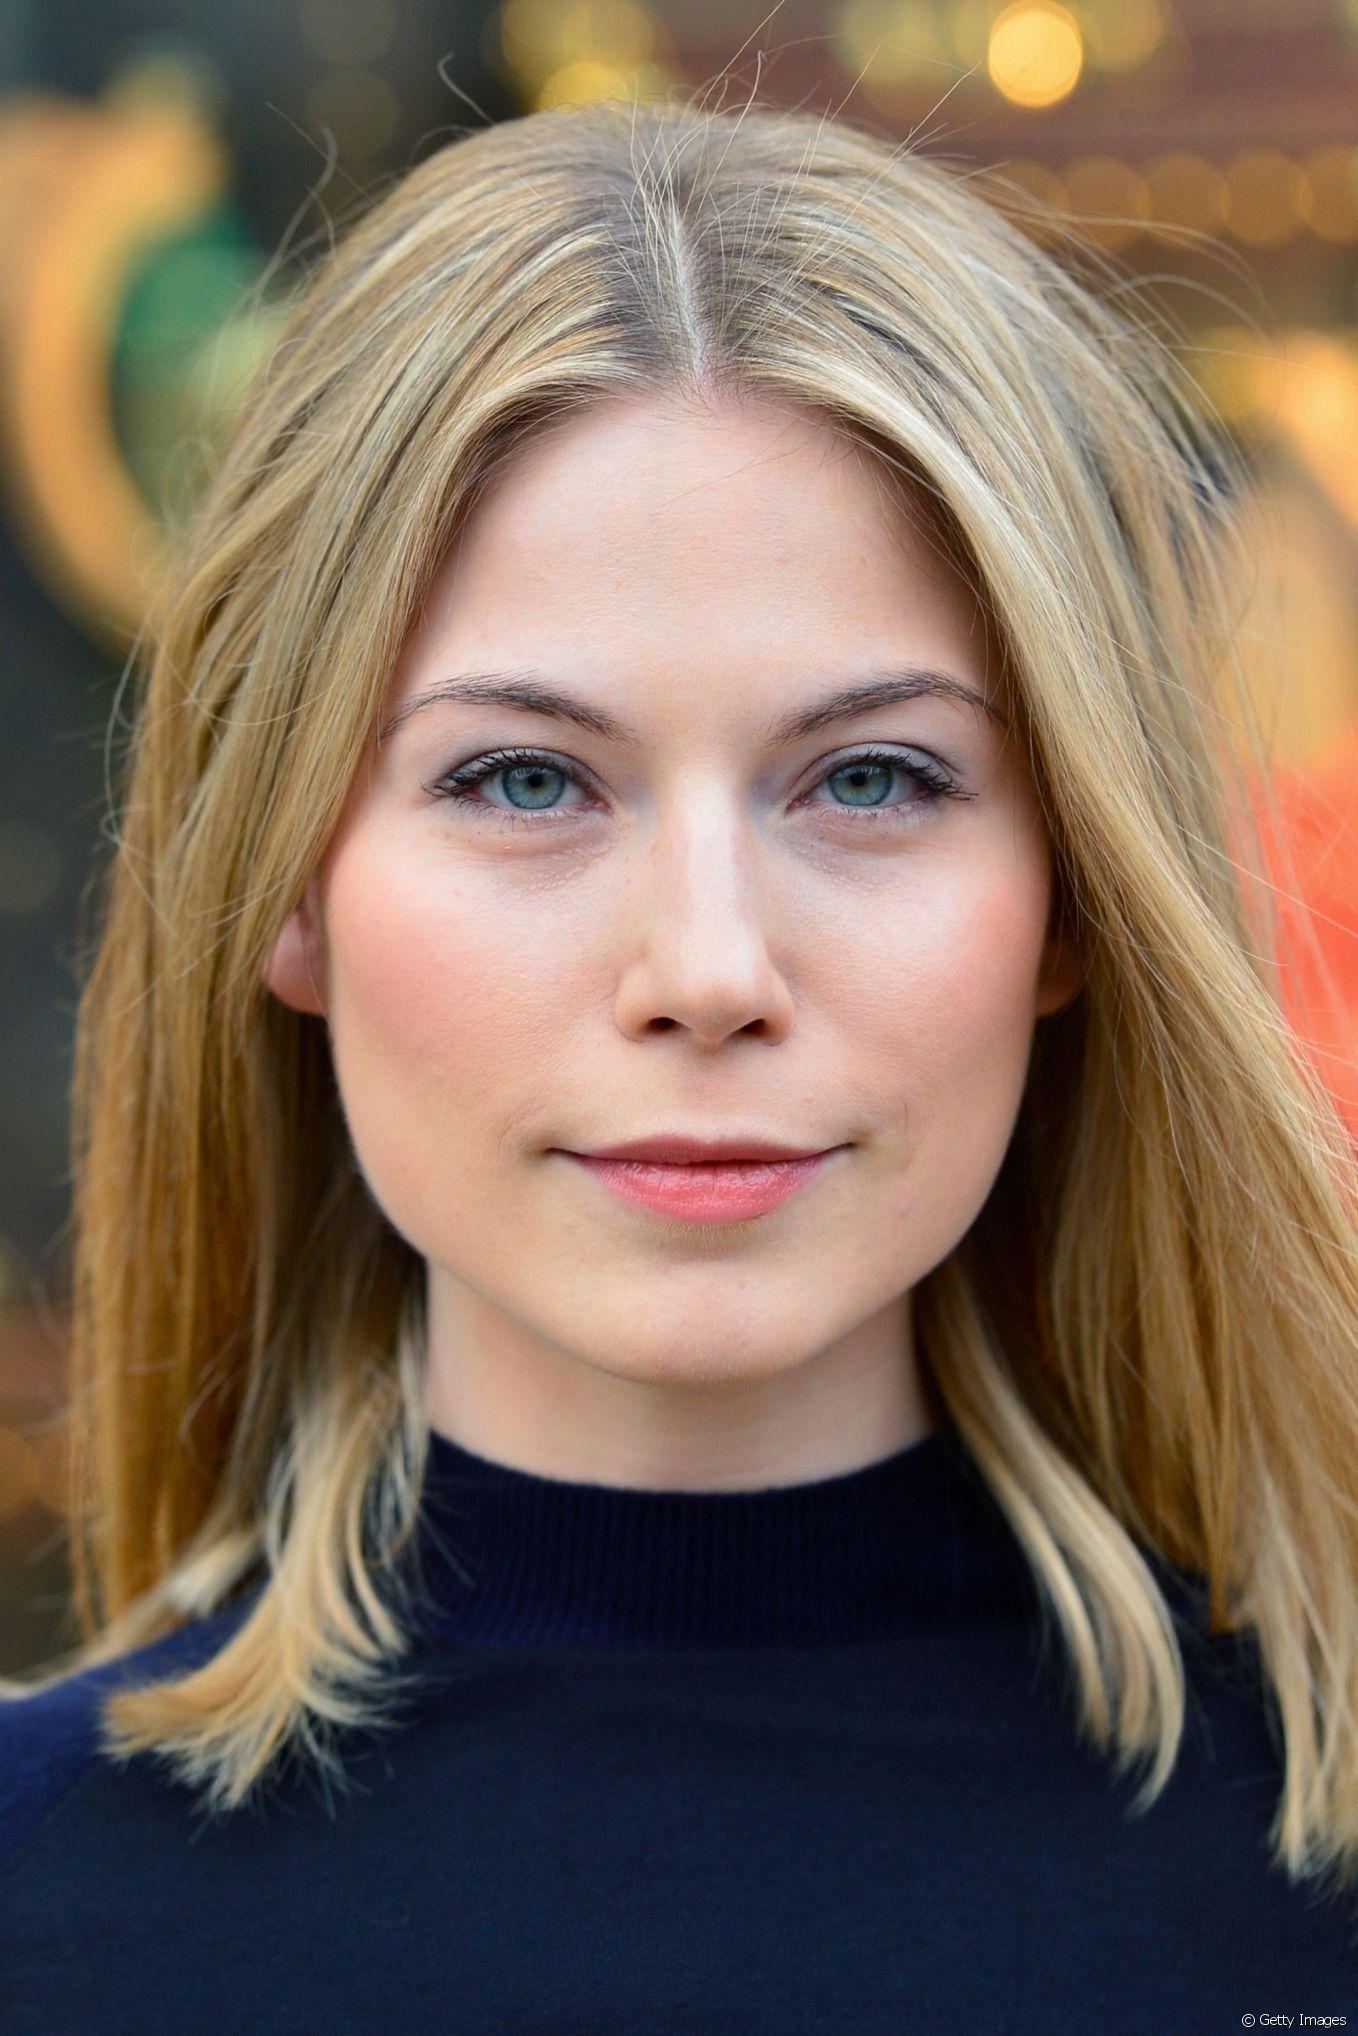 Nora von Waldstätten | Nora von waldstätten, Wunderschöne